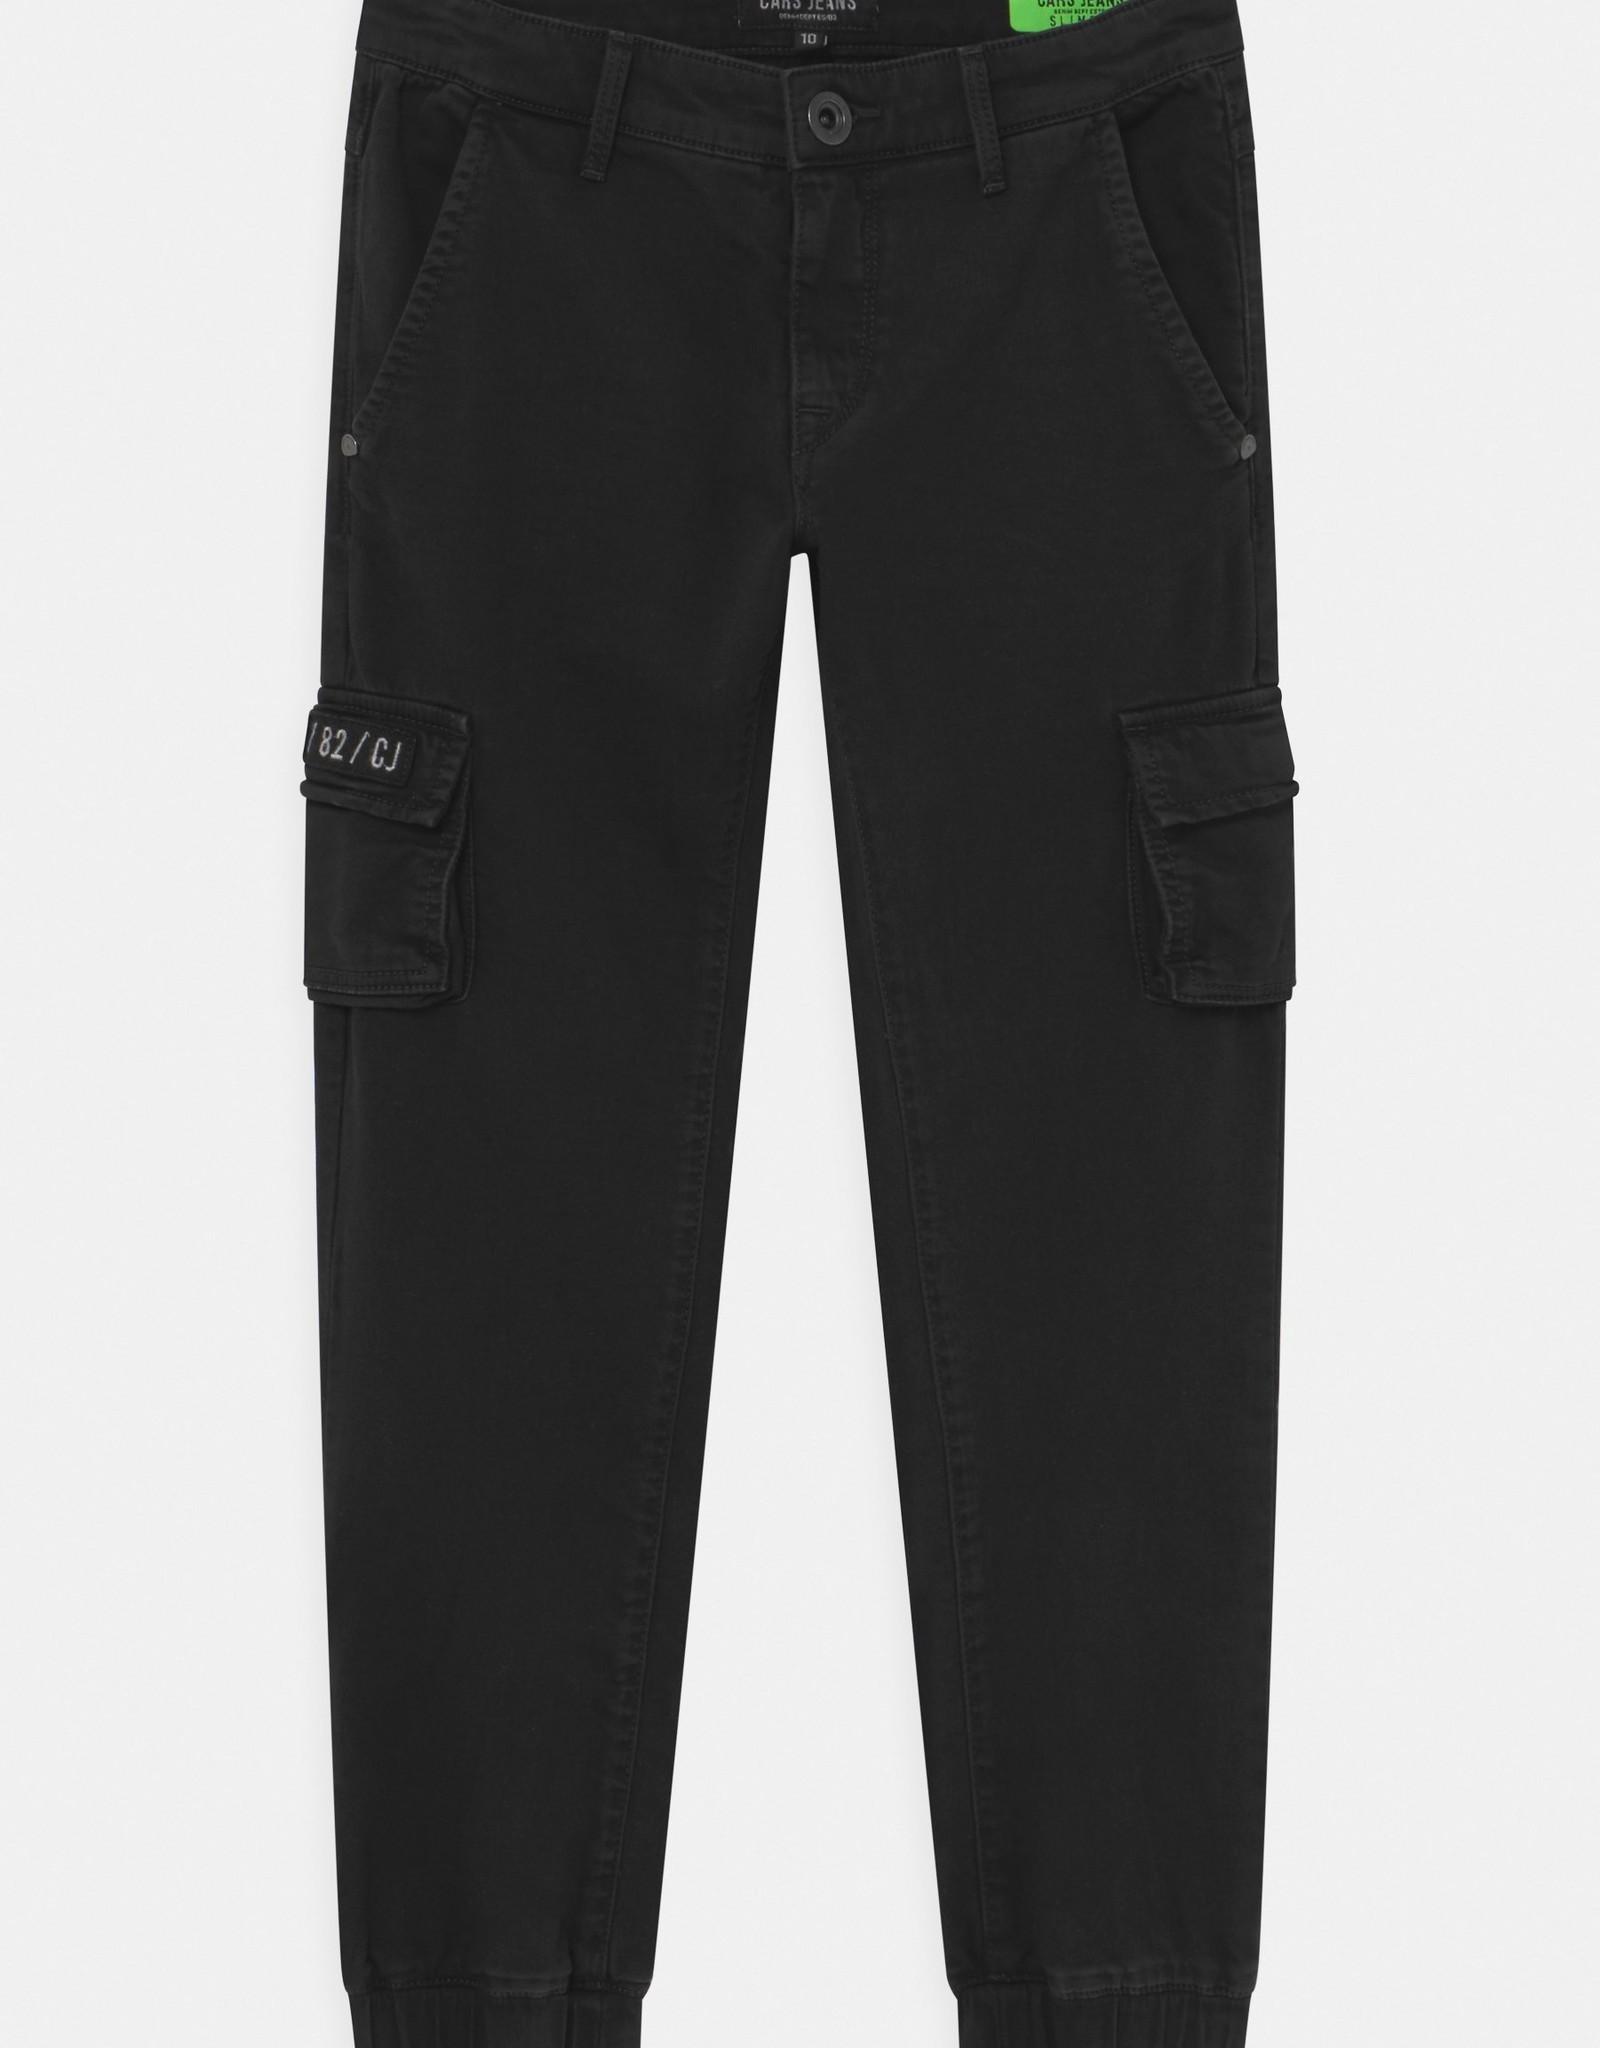 Cars Cars Jeans YUKON cargo broek zwart